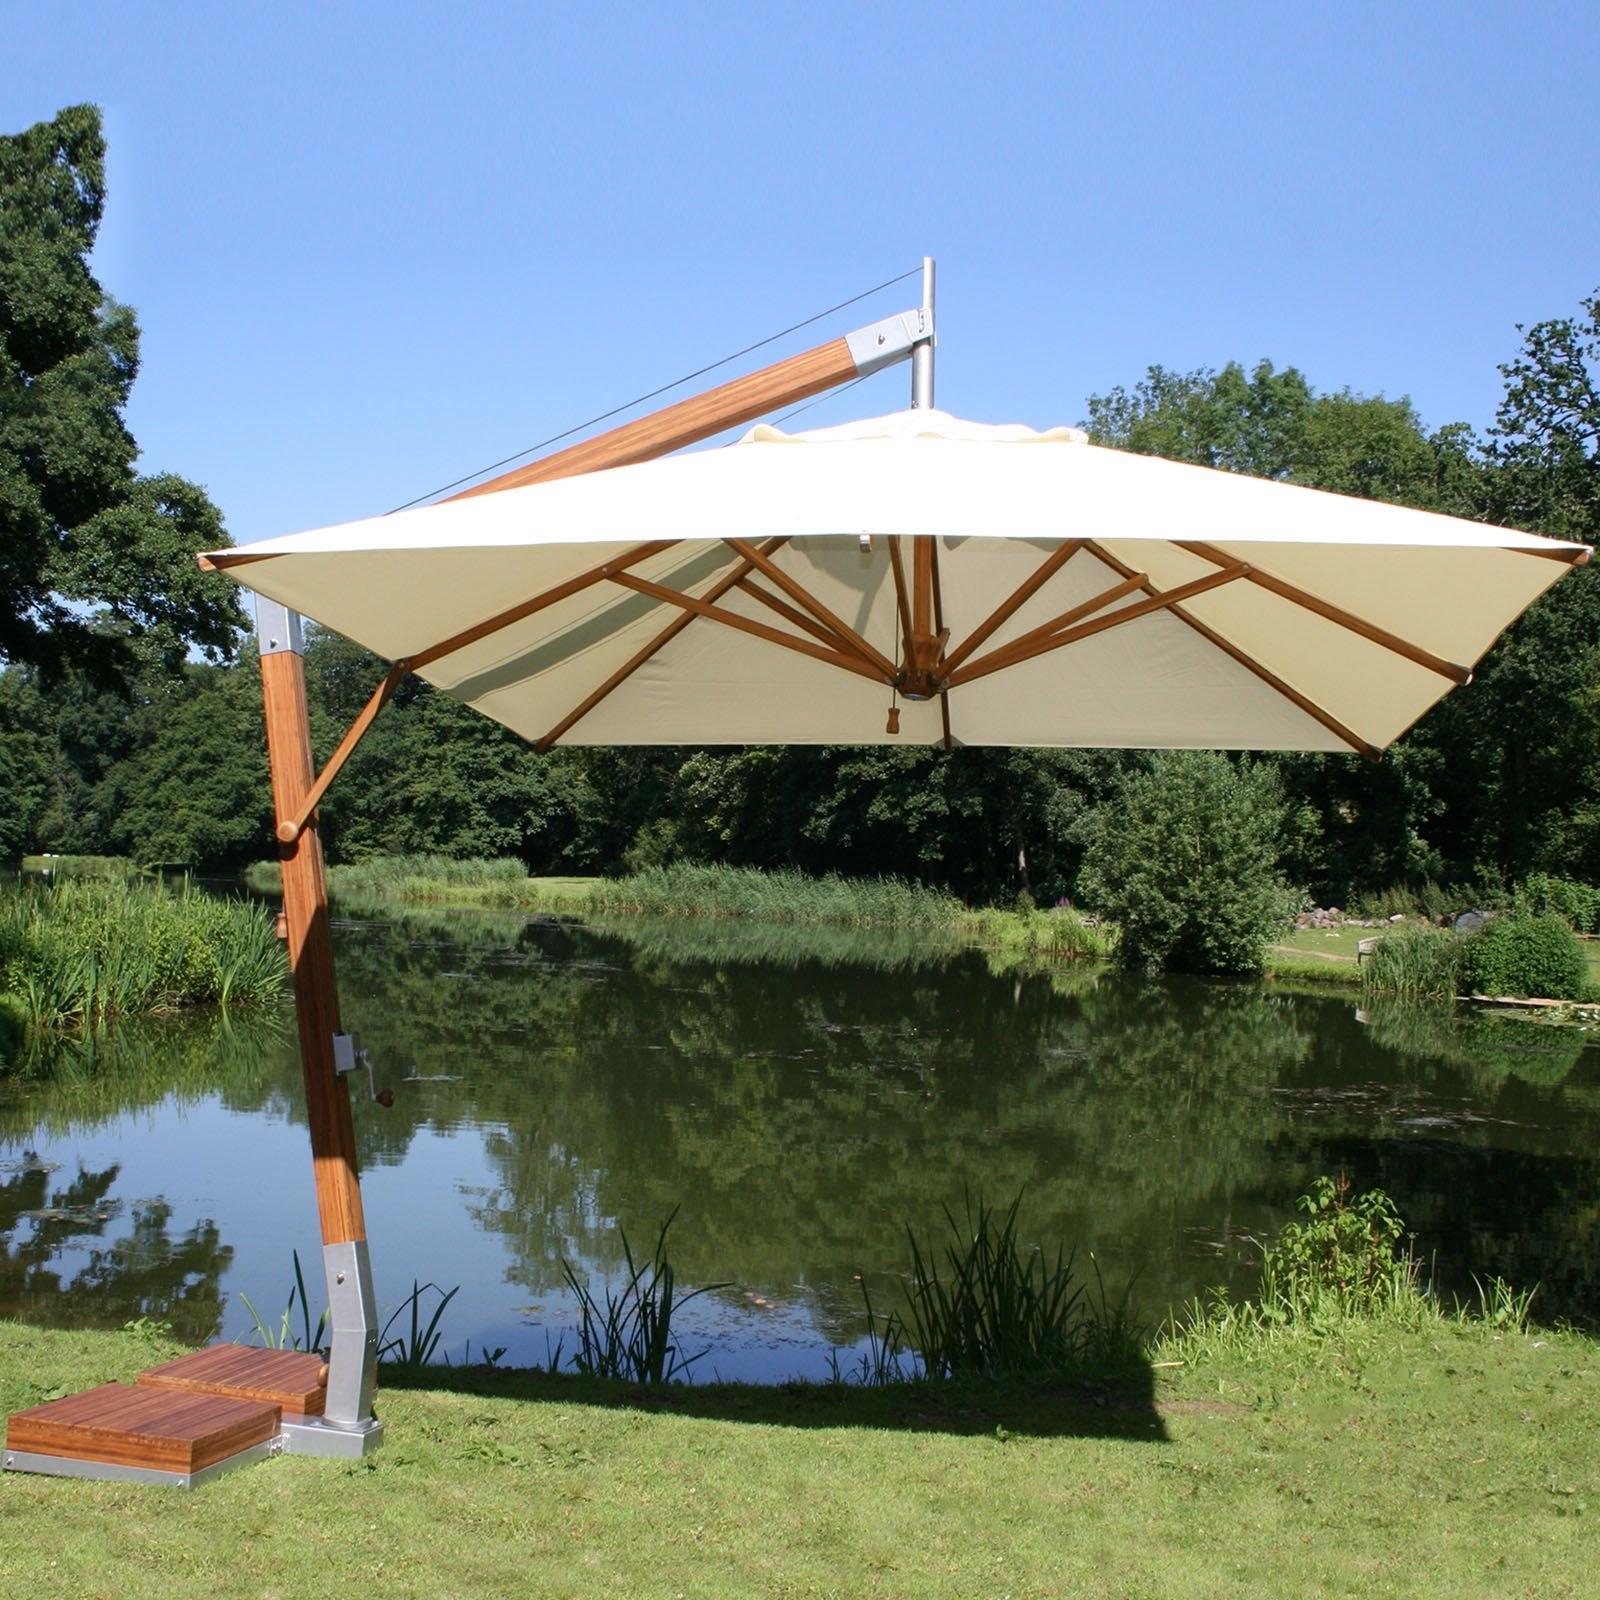 Furniture: Offset Patio Umbrellas For Your Outdoor Ideas Inside Favorite Rectangular Offset Patio Umbrellas (View 13 of 20)